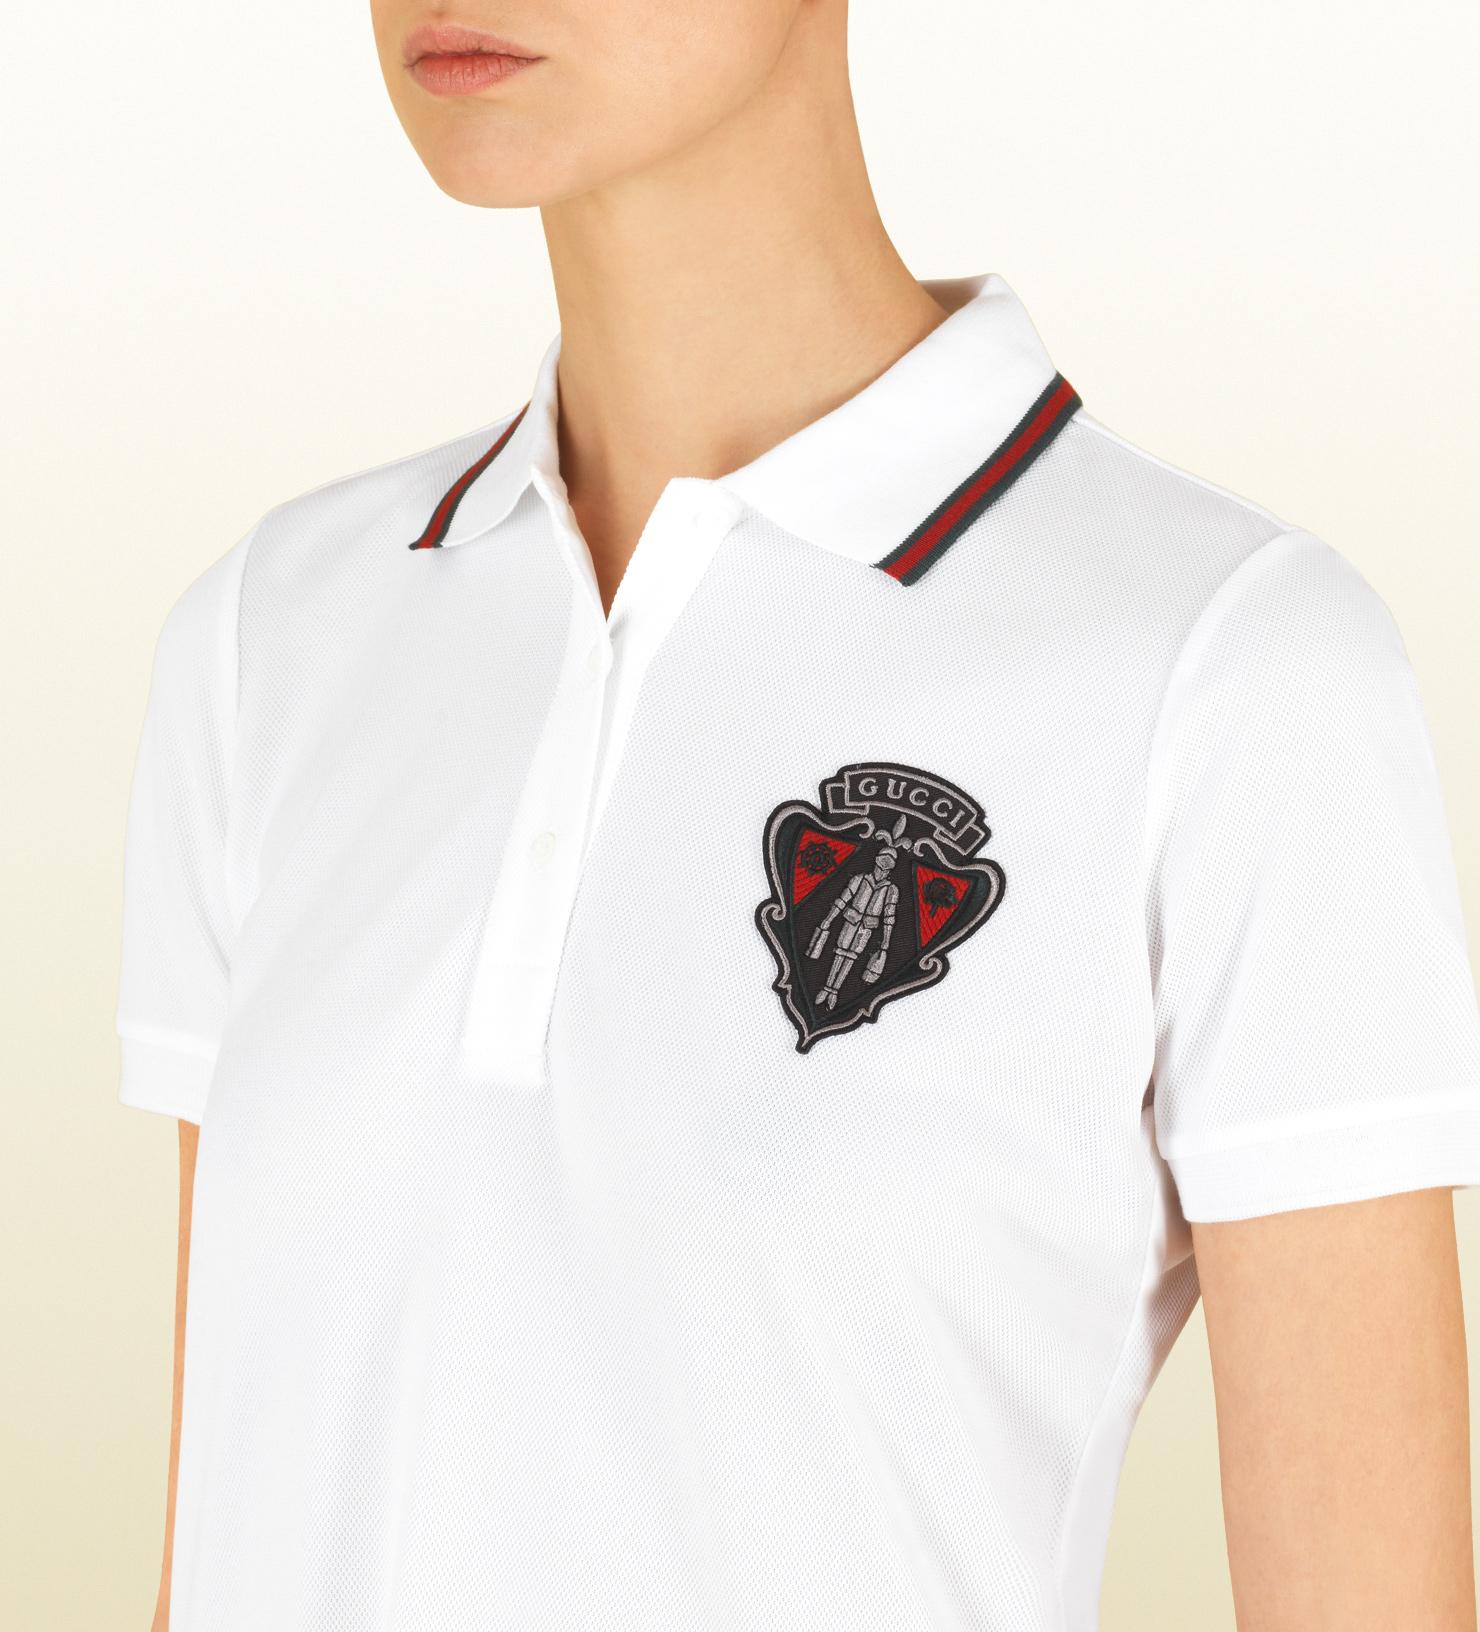 Gucci Polo T Shirt Womens f4dc1e9a6b